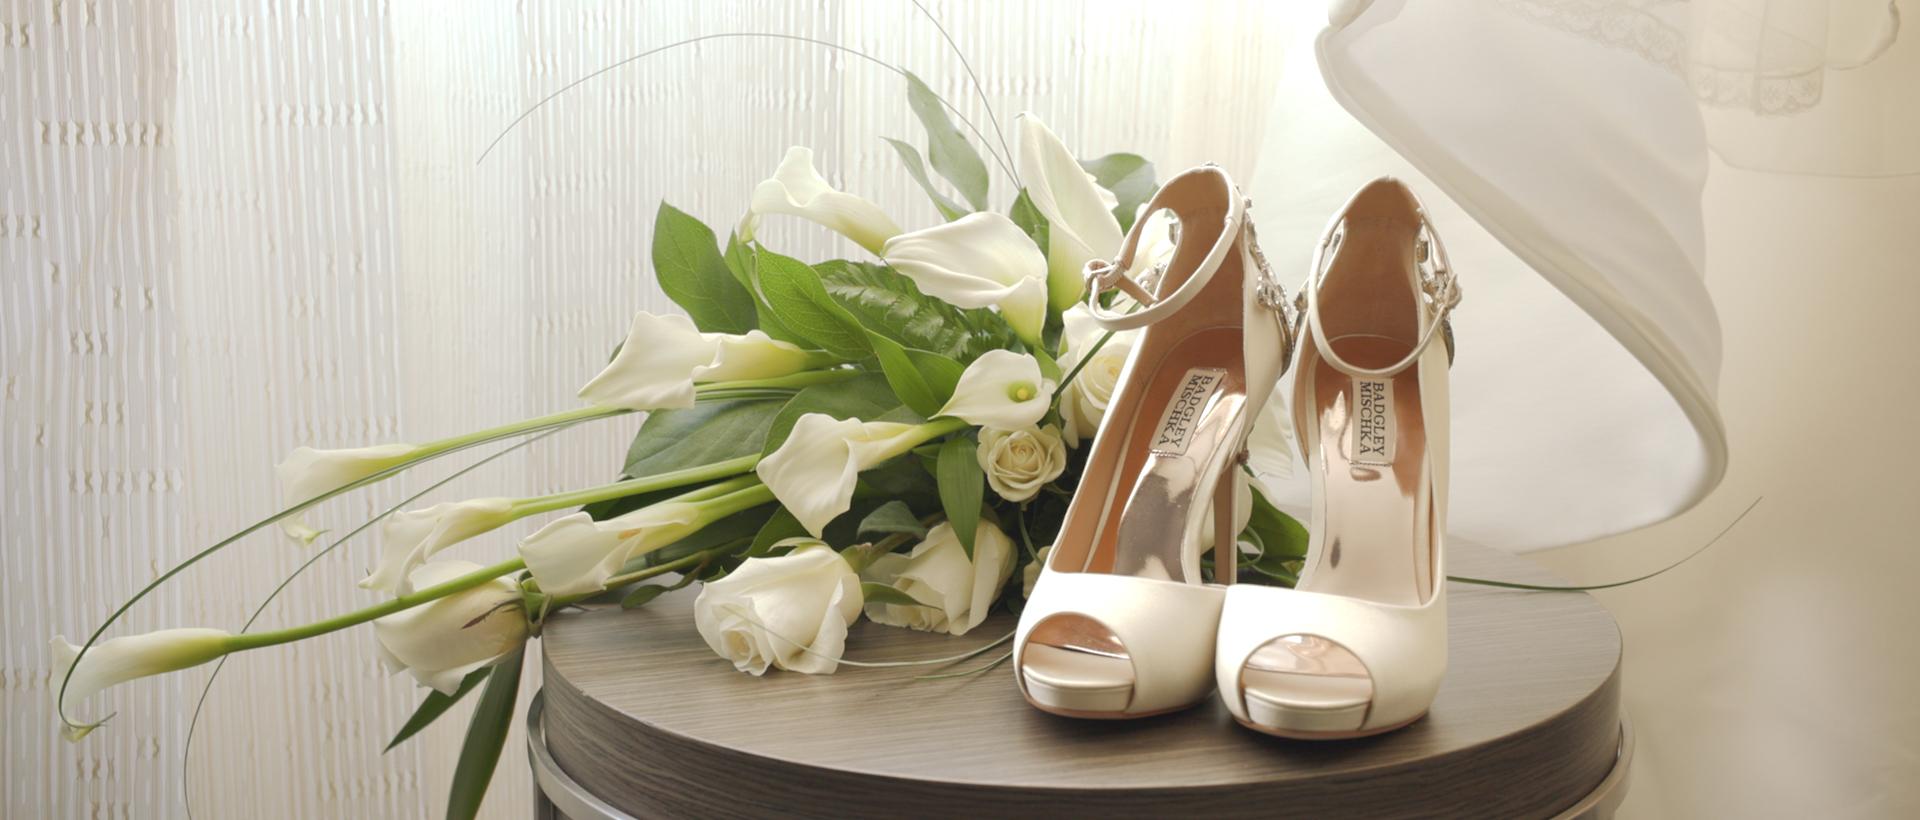 flower & shoes0.jpg